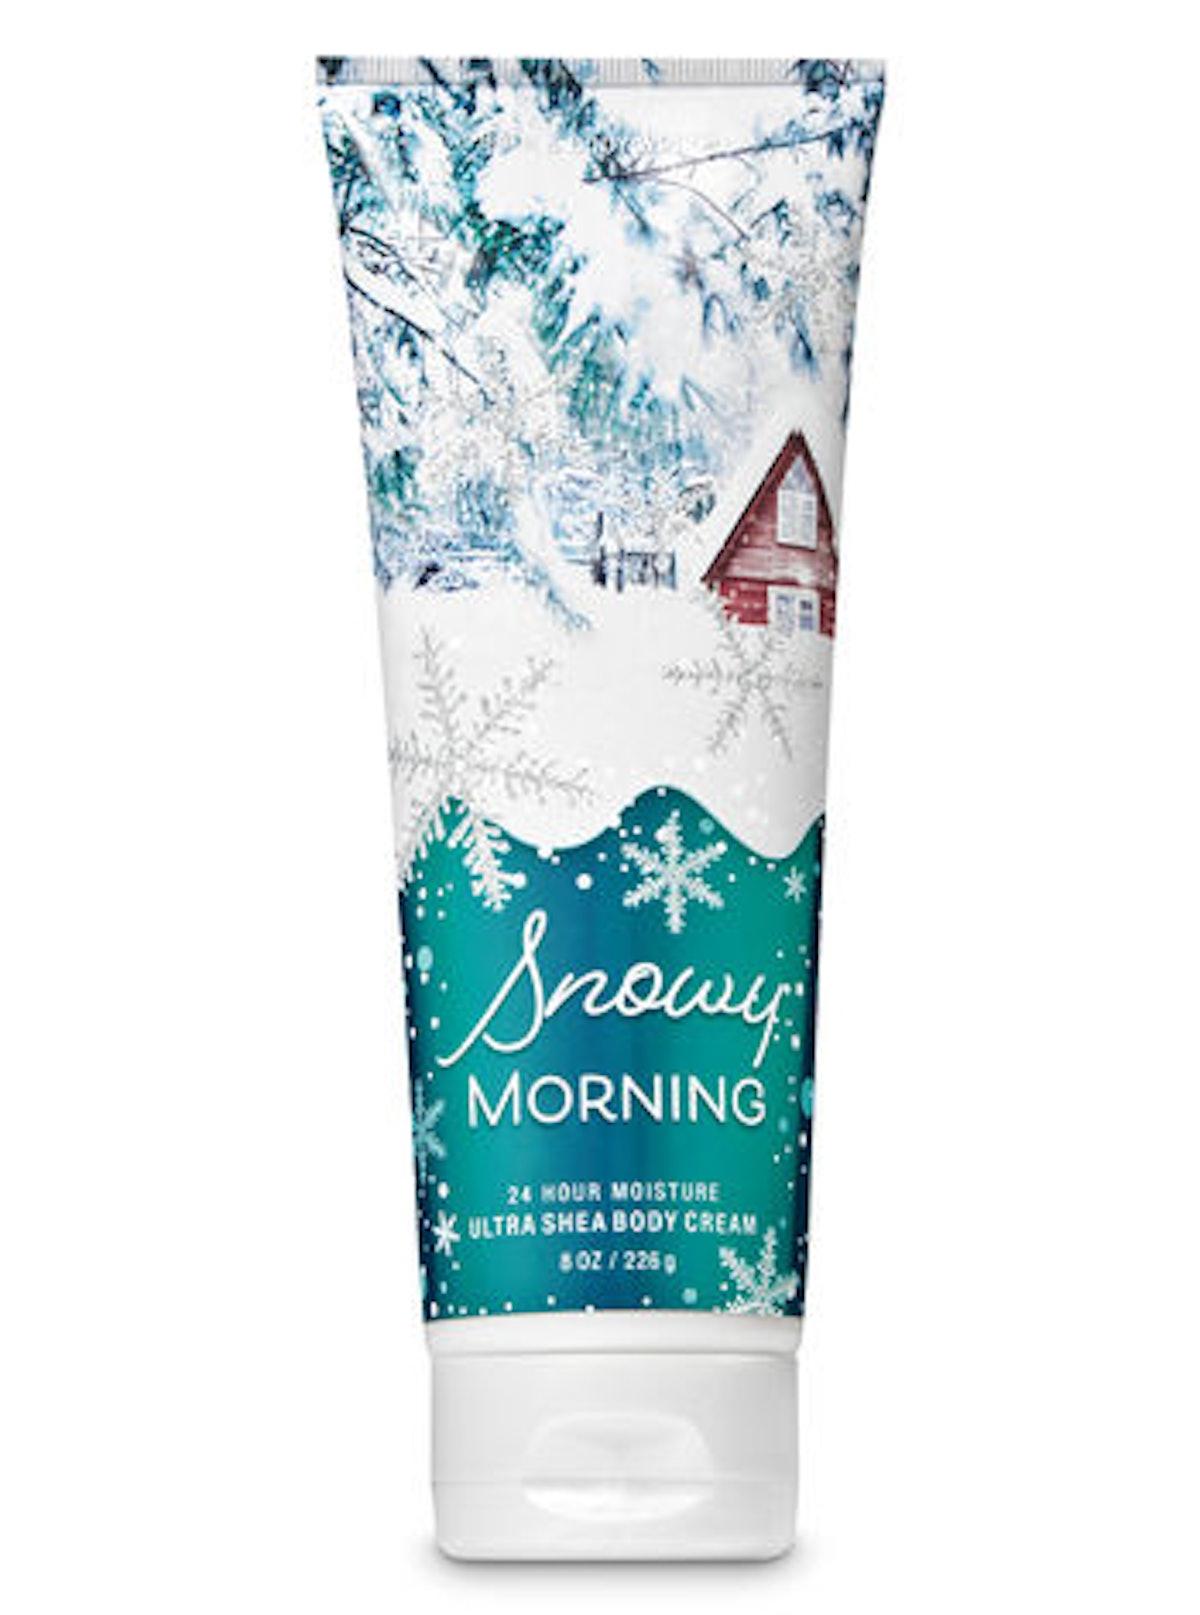 Snowy Morning Ultra Shea Body Cream